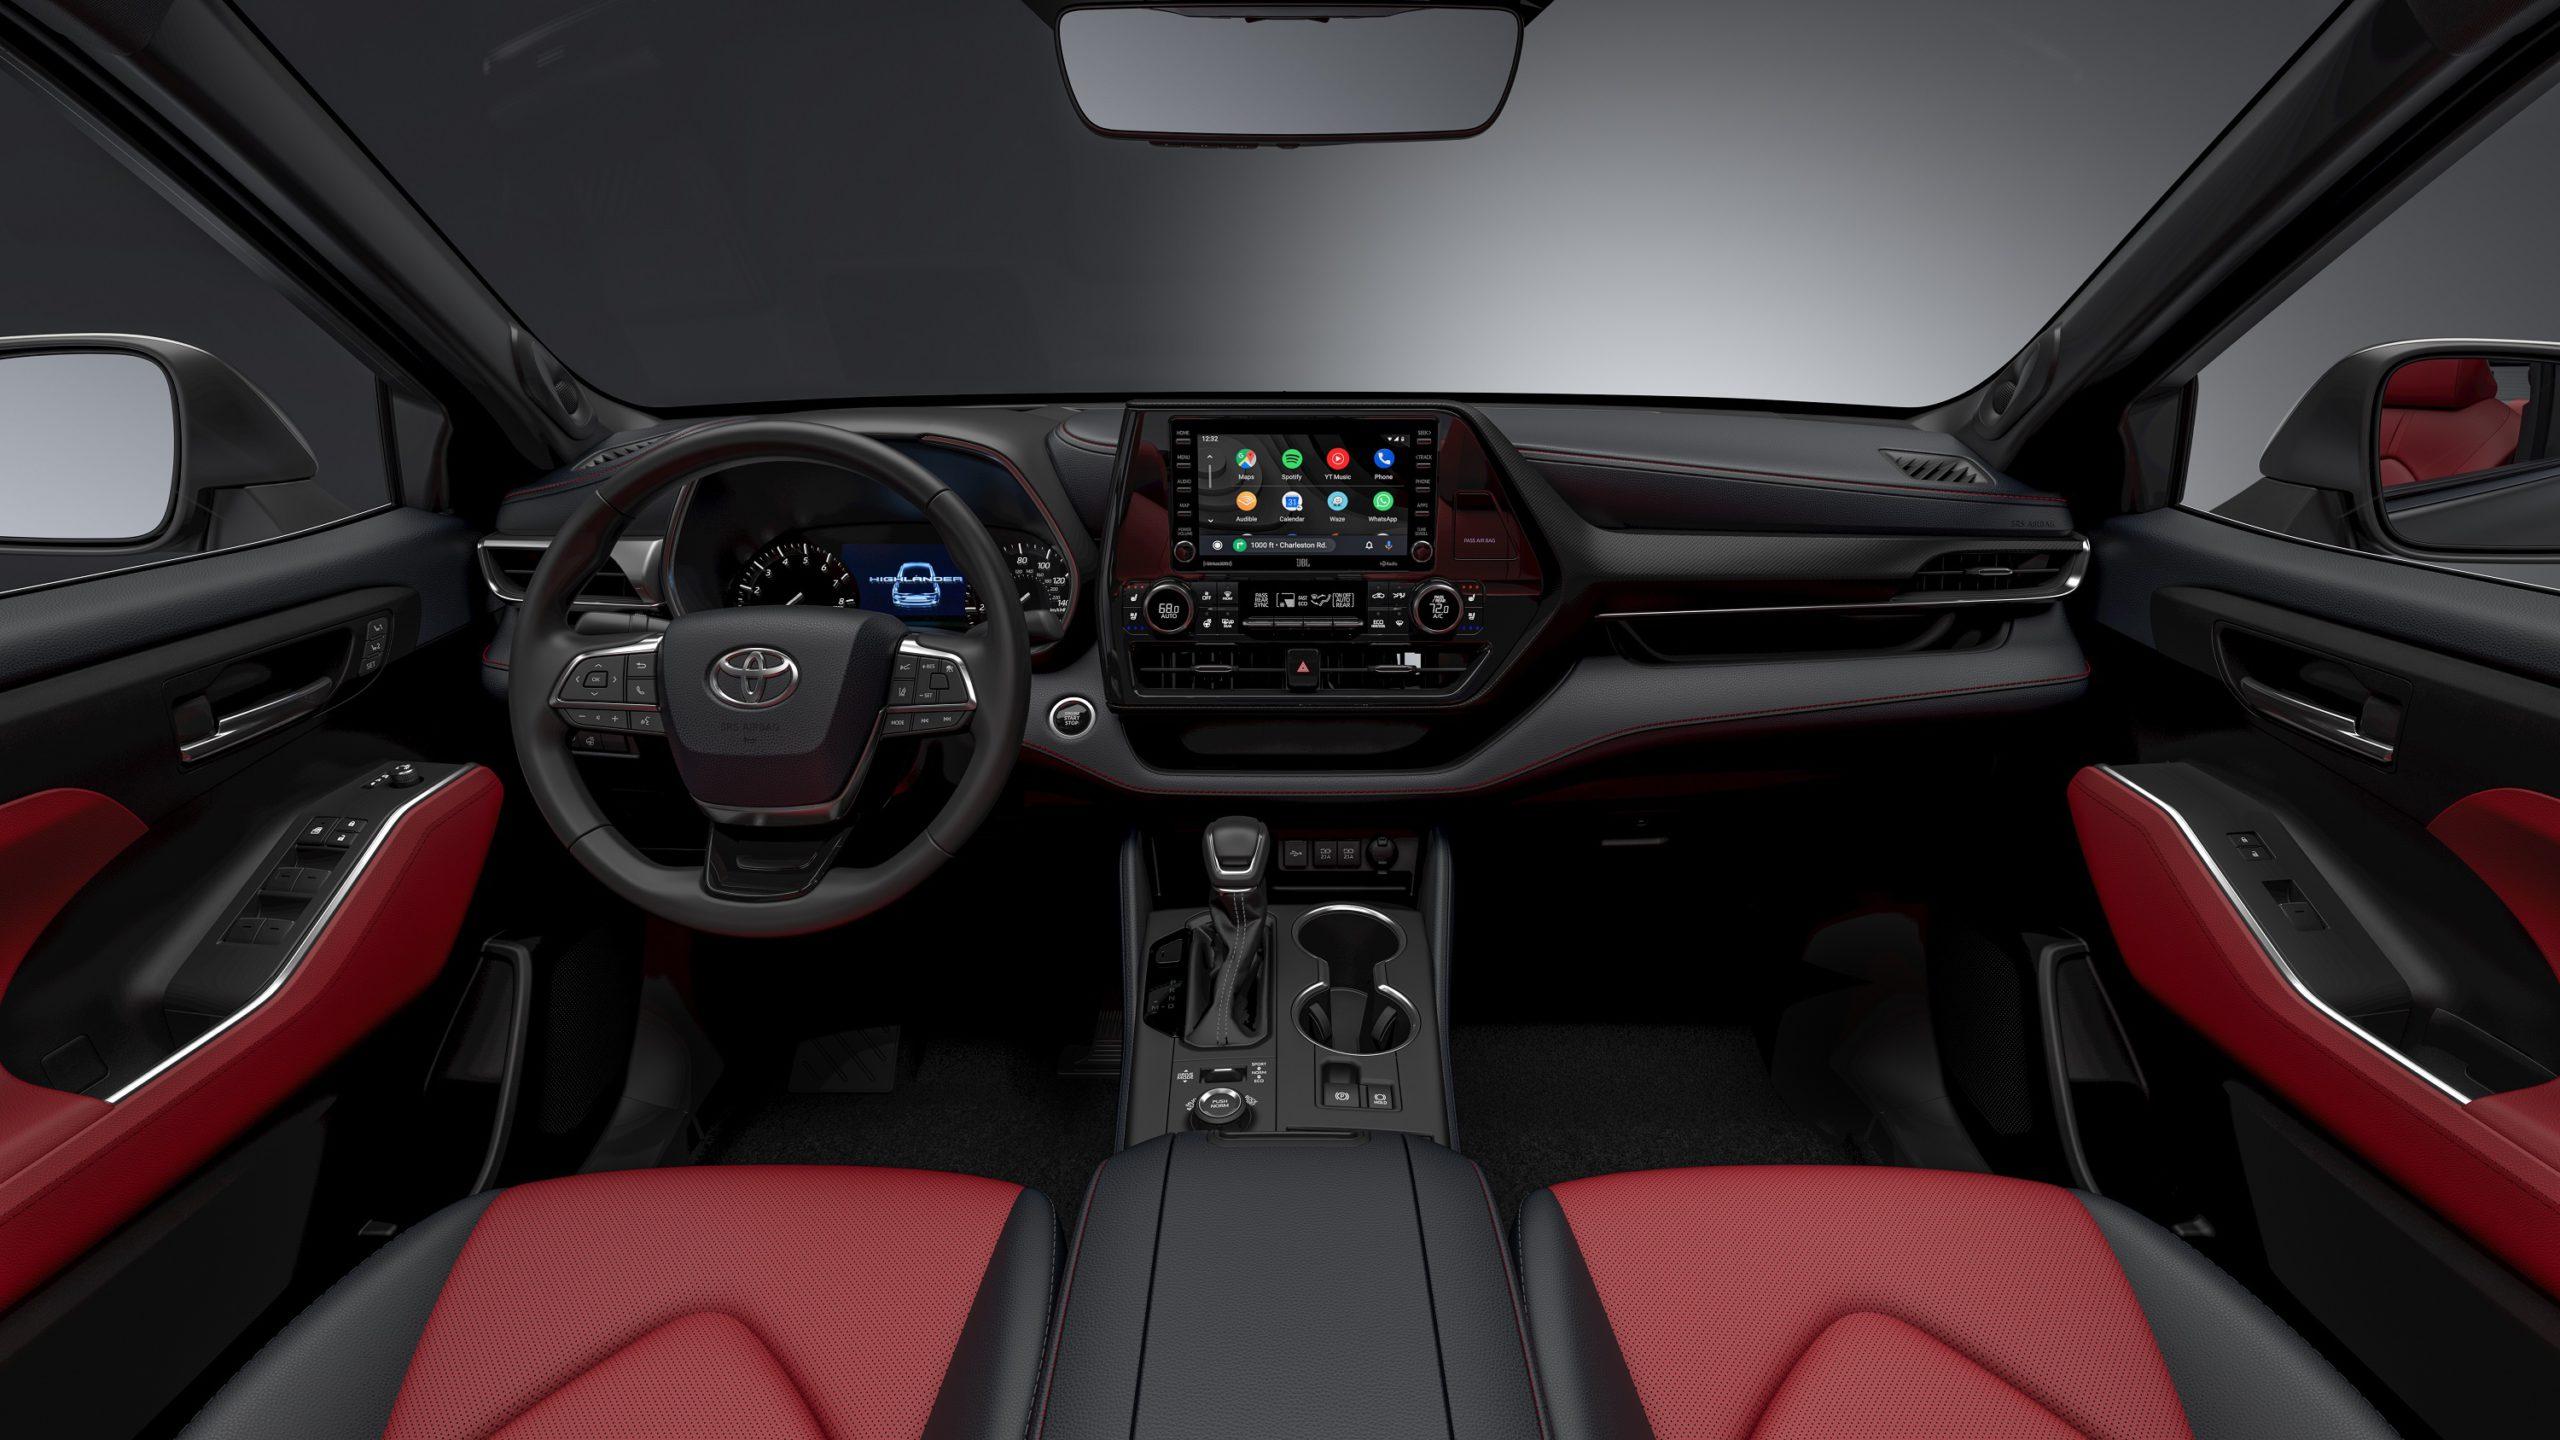 2021 Toyota Highlander XSE trim interior